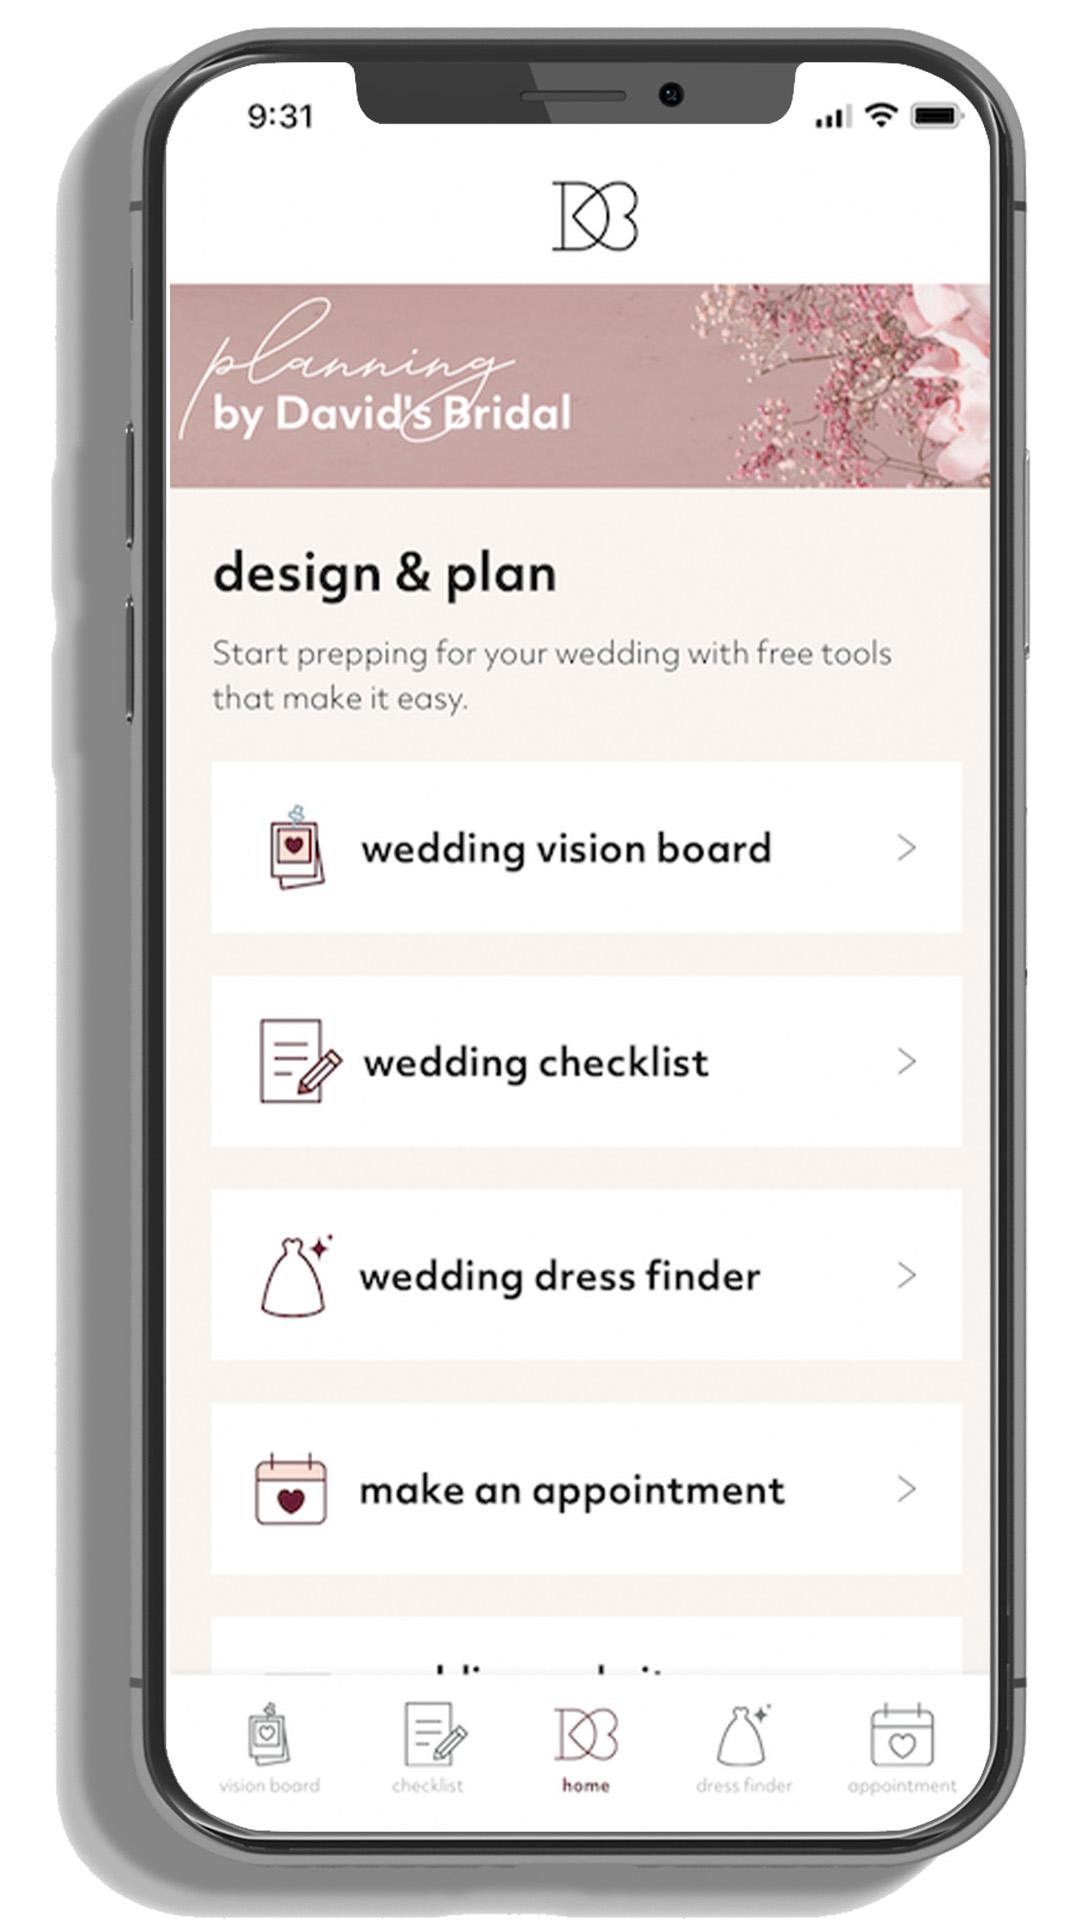 David's Bridal wedding planning app